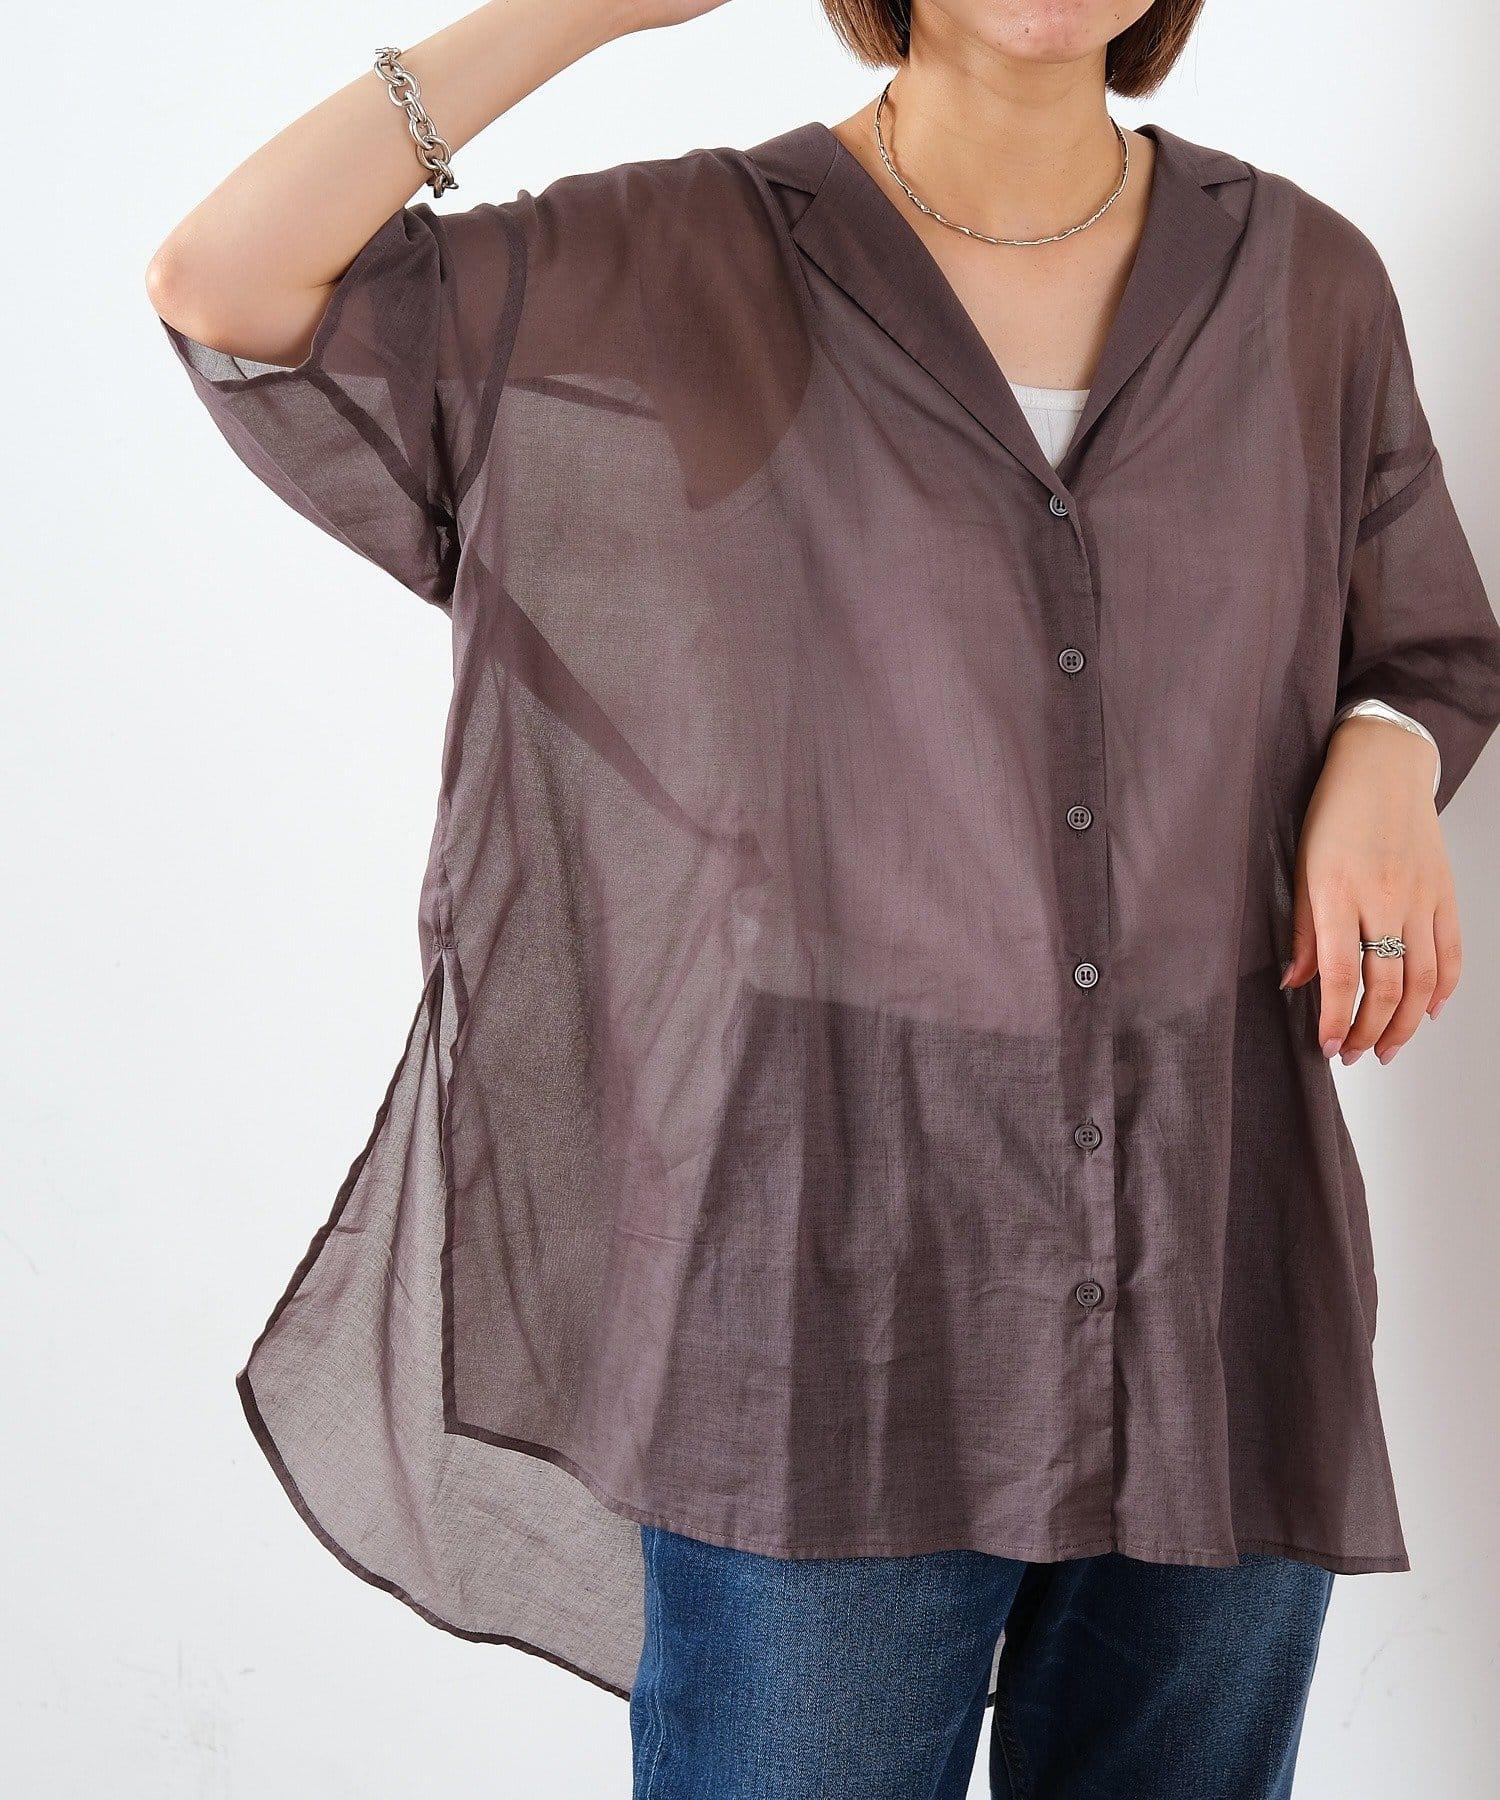 CIAOPANIC TYPY(チャオパニックティピー) 綿シアー開襟スリットカラーシャツ